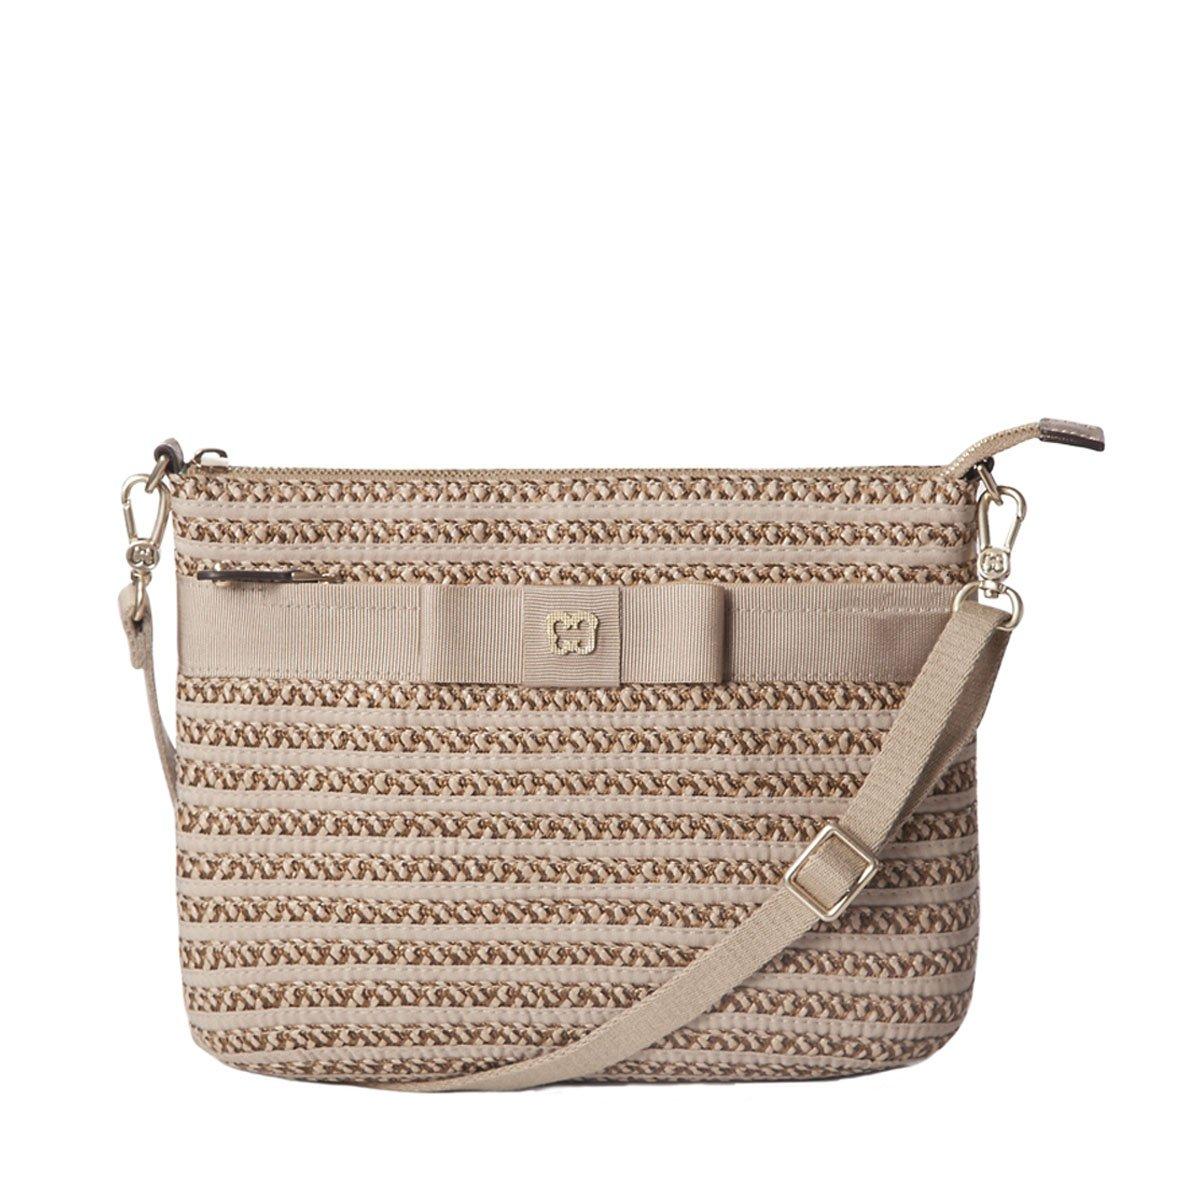 Eric Javits Designer Women's Luxury Handbag Dame Pouch Bark